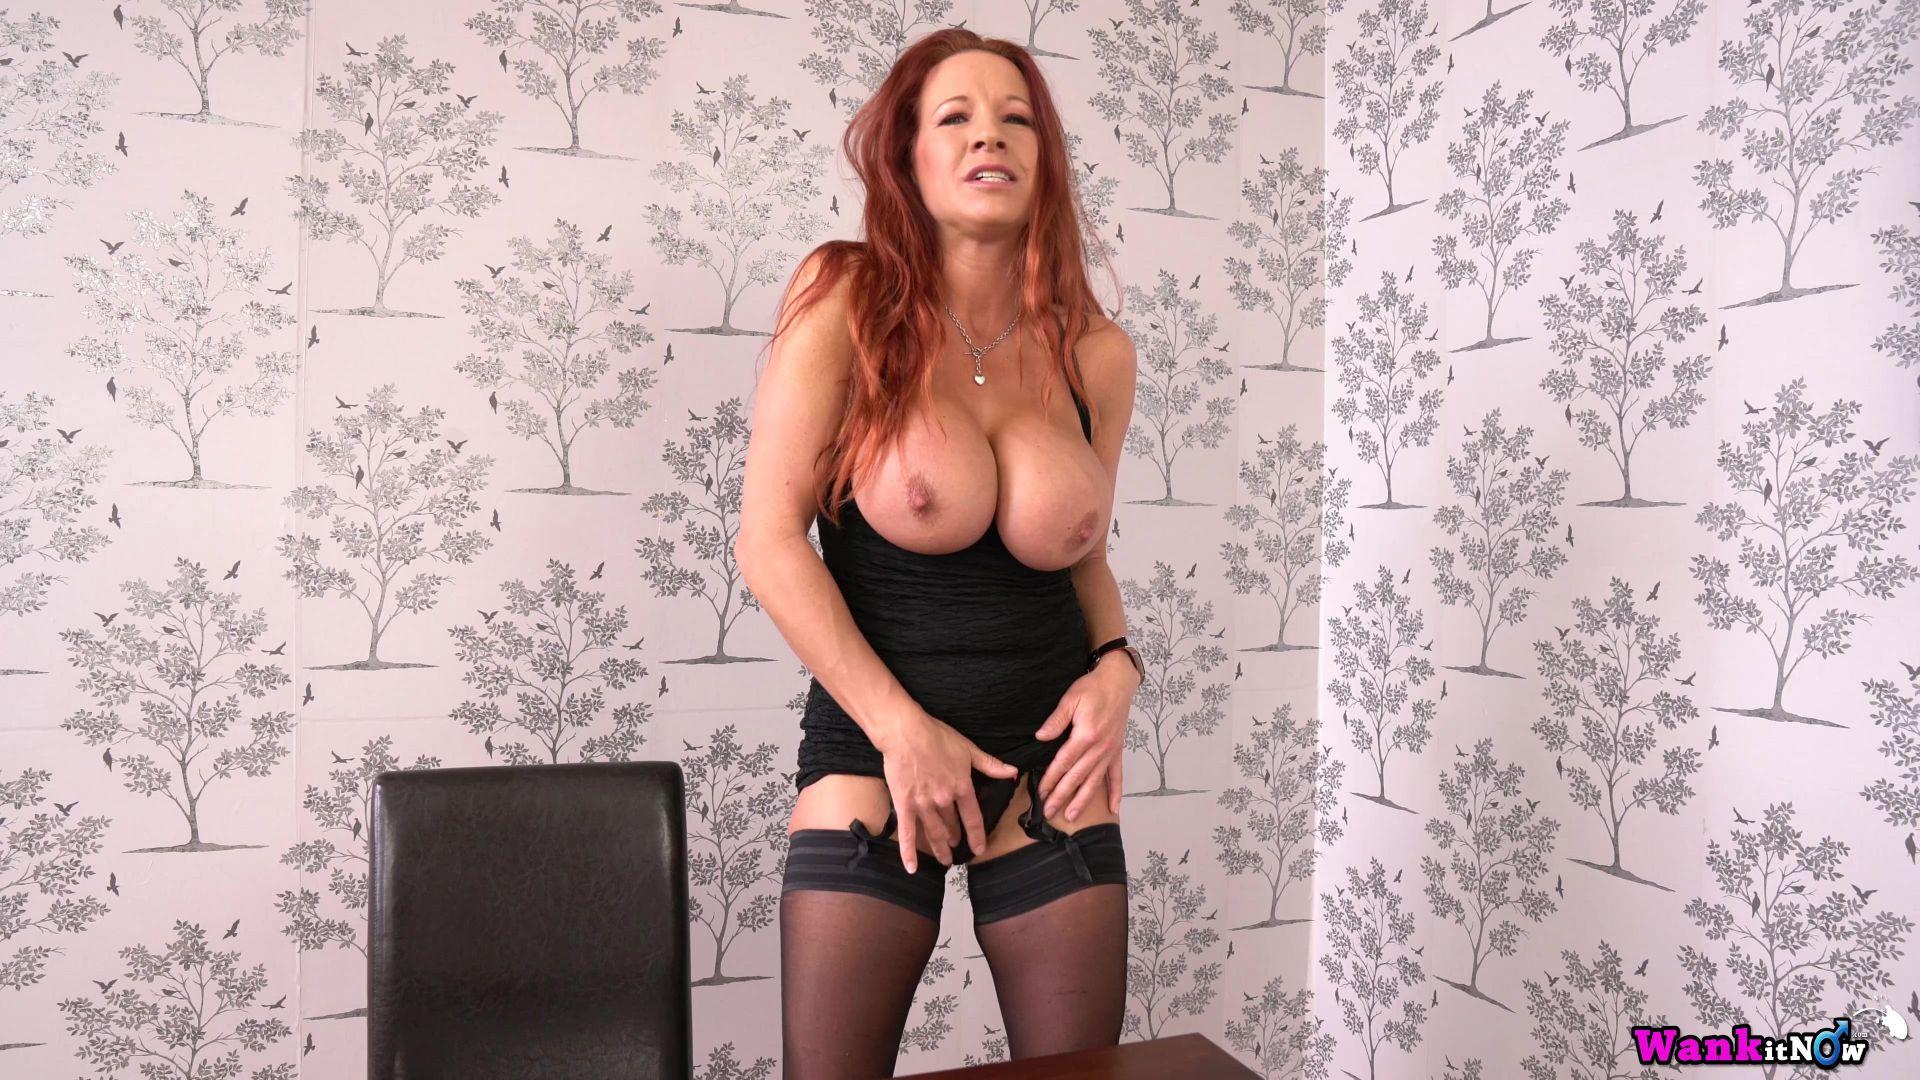 My naughty album hot ukrainian amateur in photoshoot sex - 1 part 9